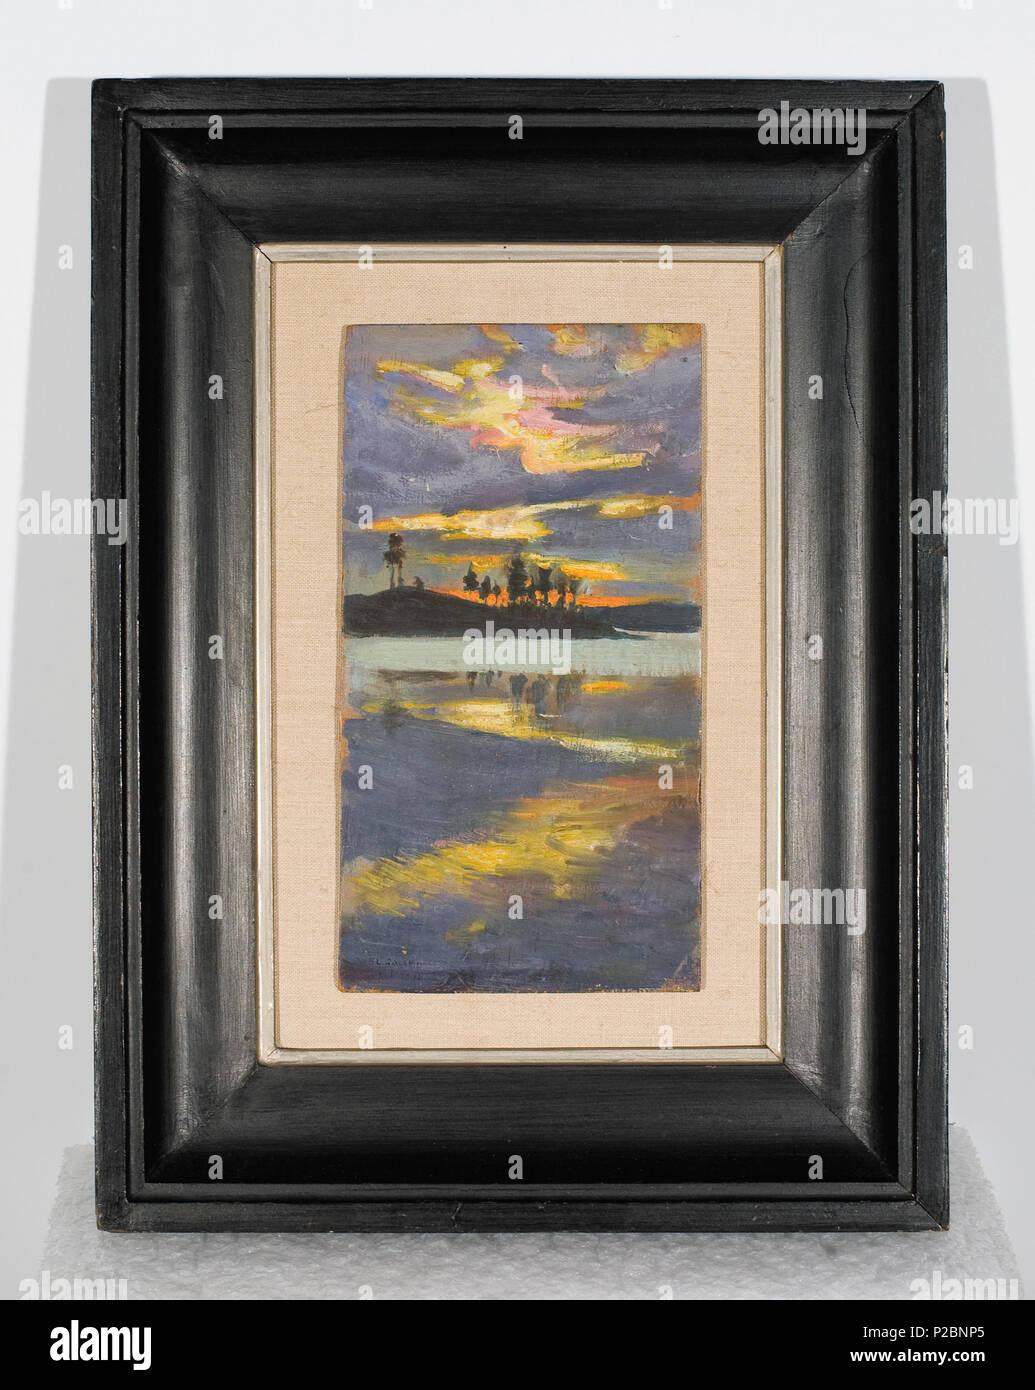 . Iltarusko visuvedellä . 1891 25 Auringonlasku Visuvedella - Stock Image